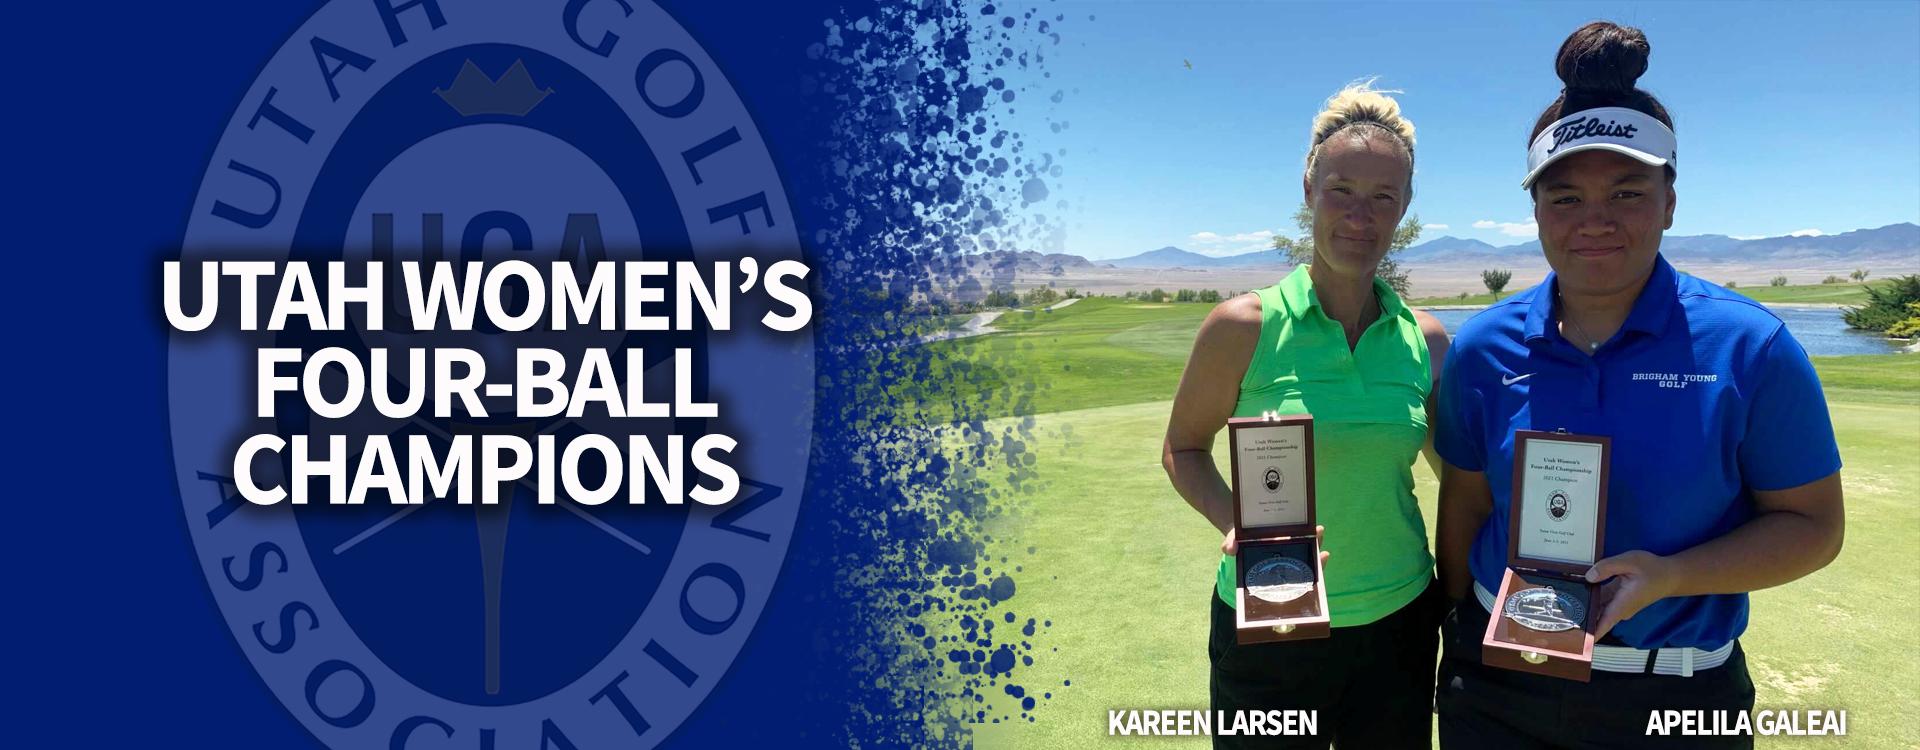 Utah-Women's-Four-Ball-Champion